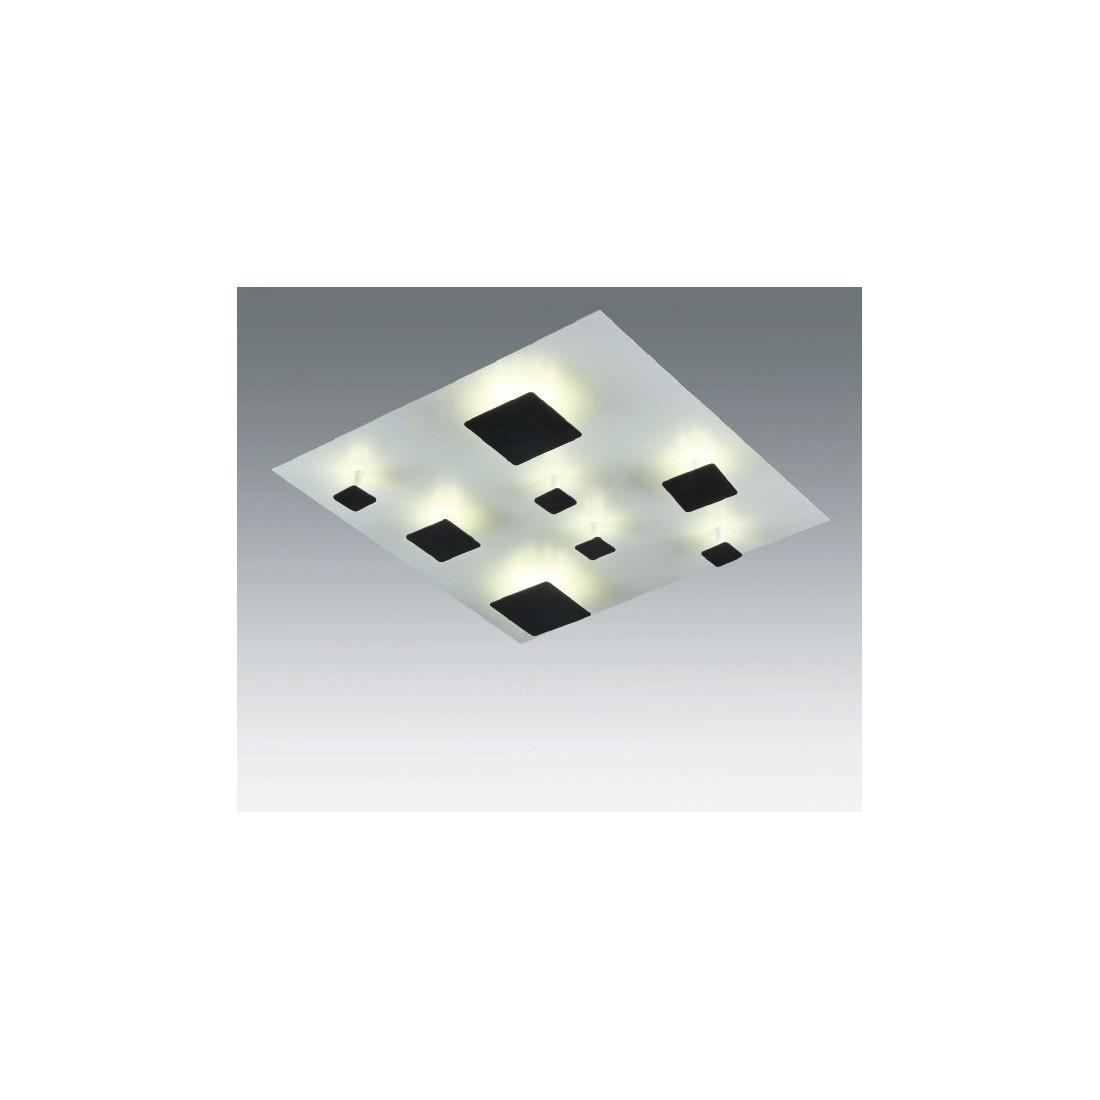 Lamparas Apliques Para Baño:apliques para baño, apliques rogu, lamparas rogu, rogu iluminacion